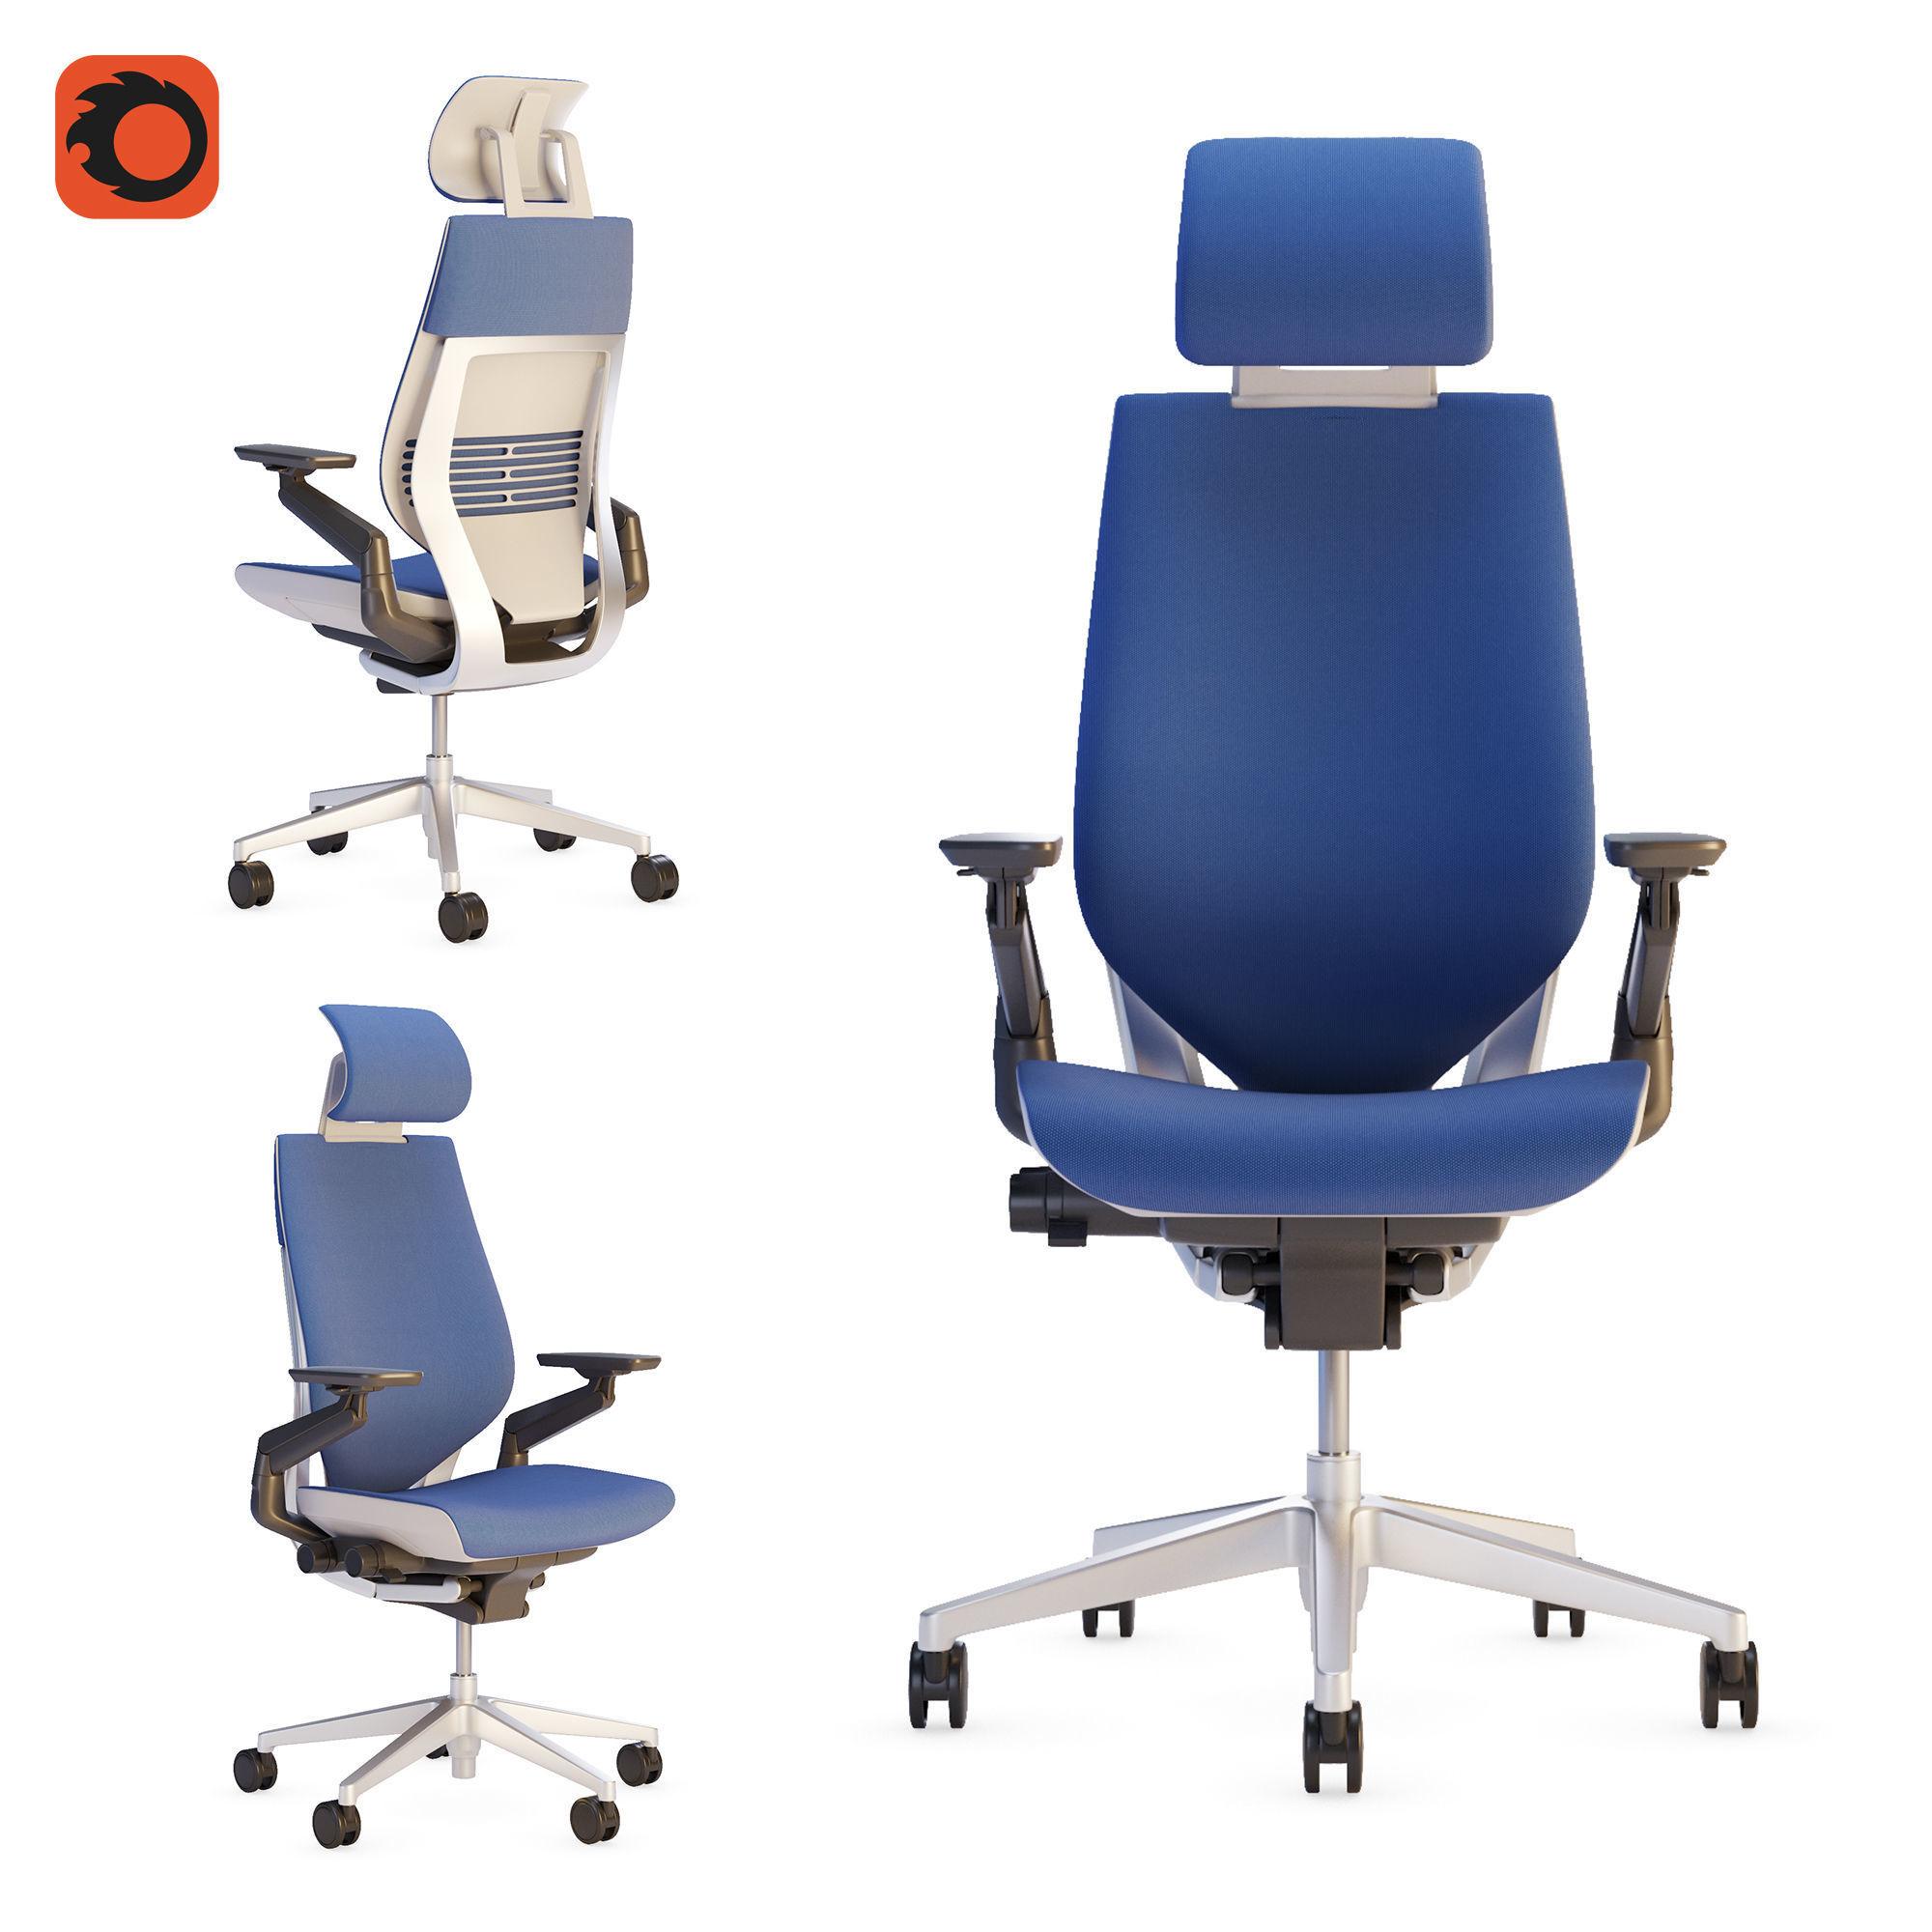 Steelcase - Office Chair Gesture